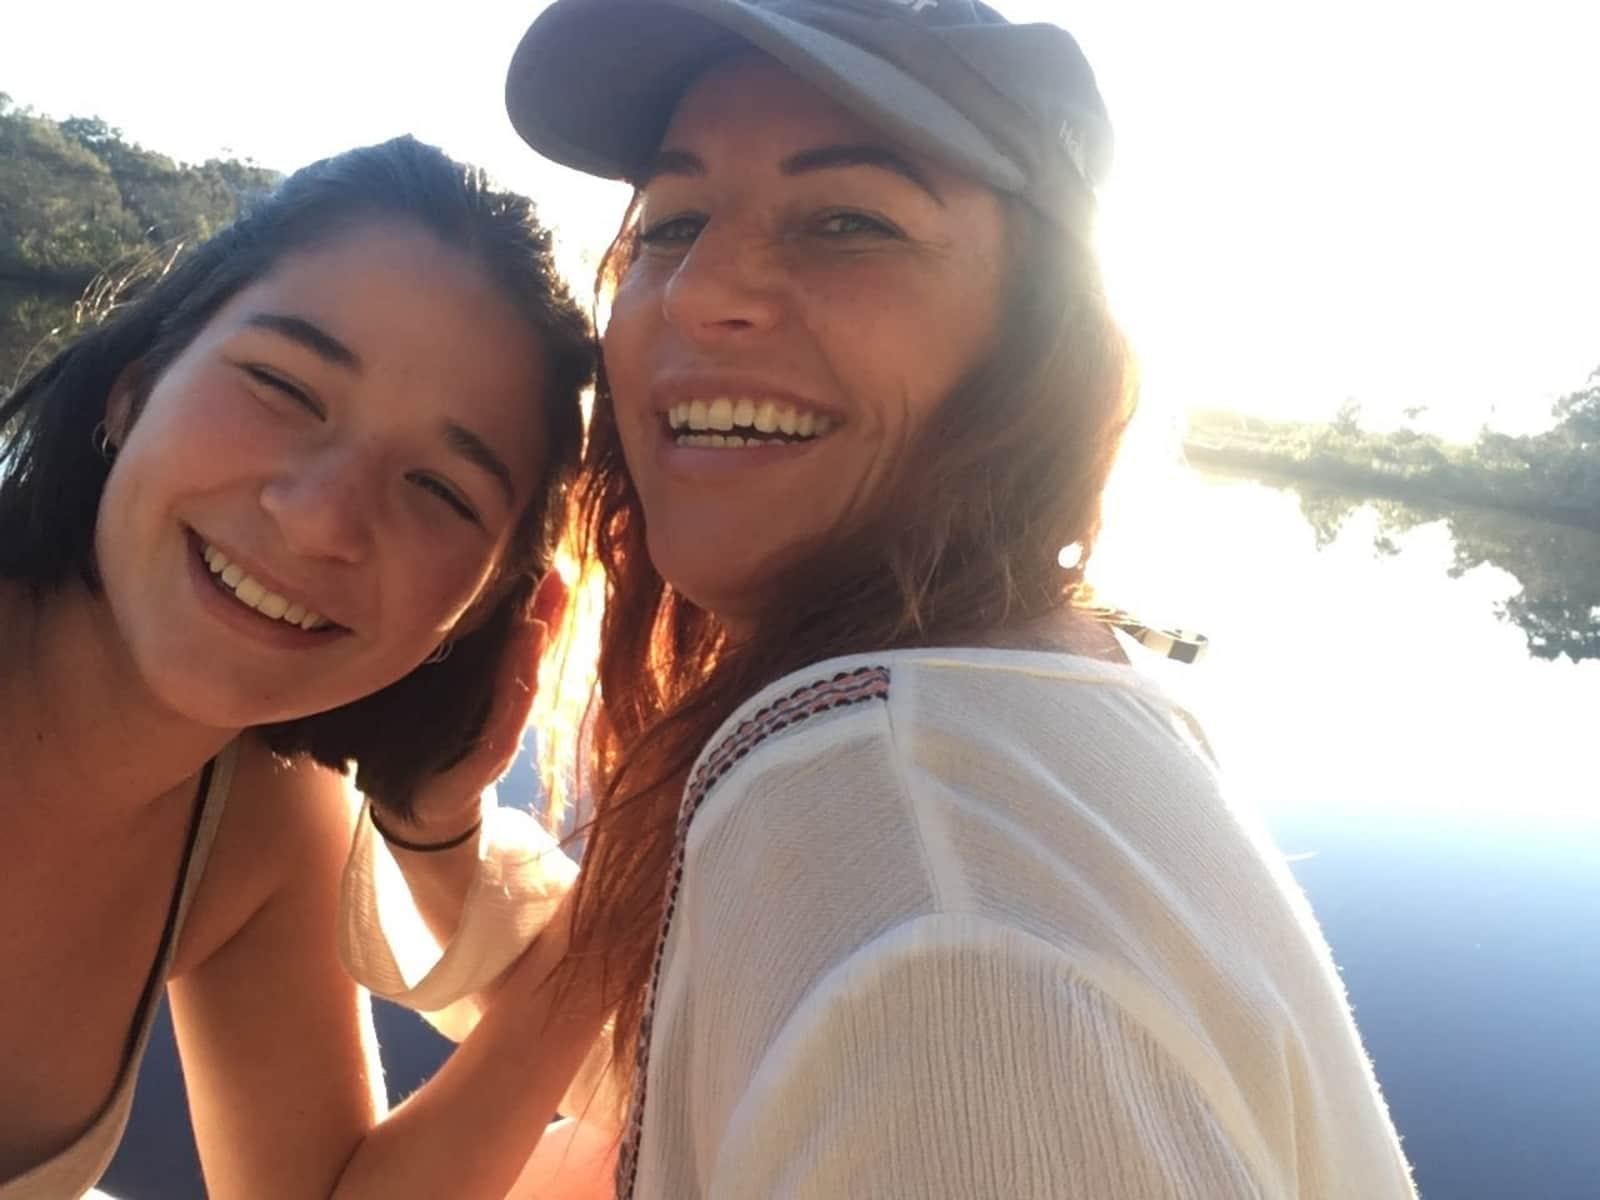 Cathy from Melbourne, Victoria, Australia